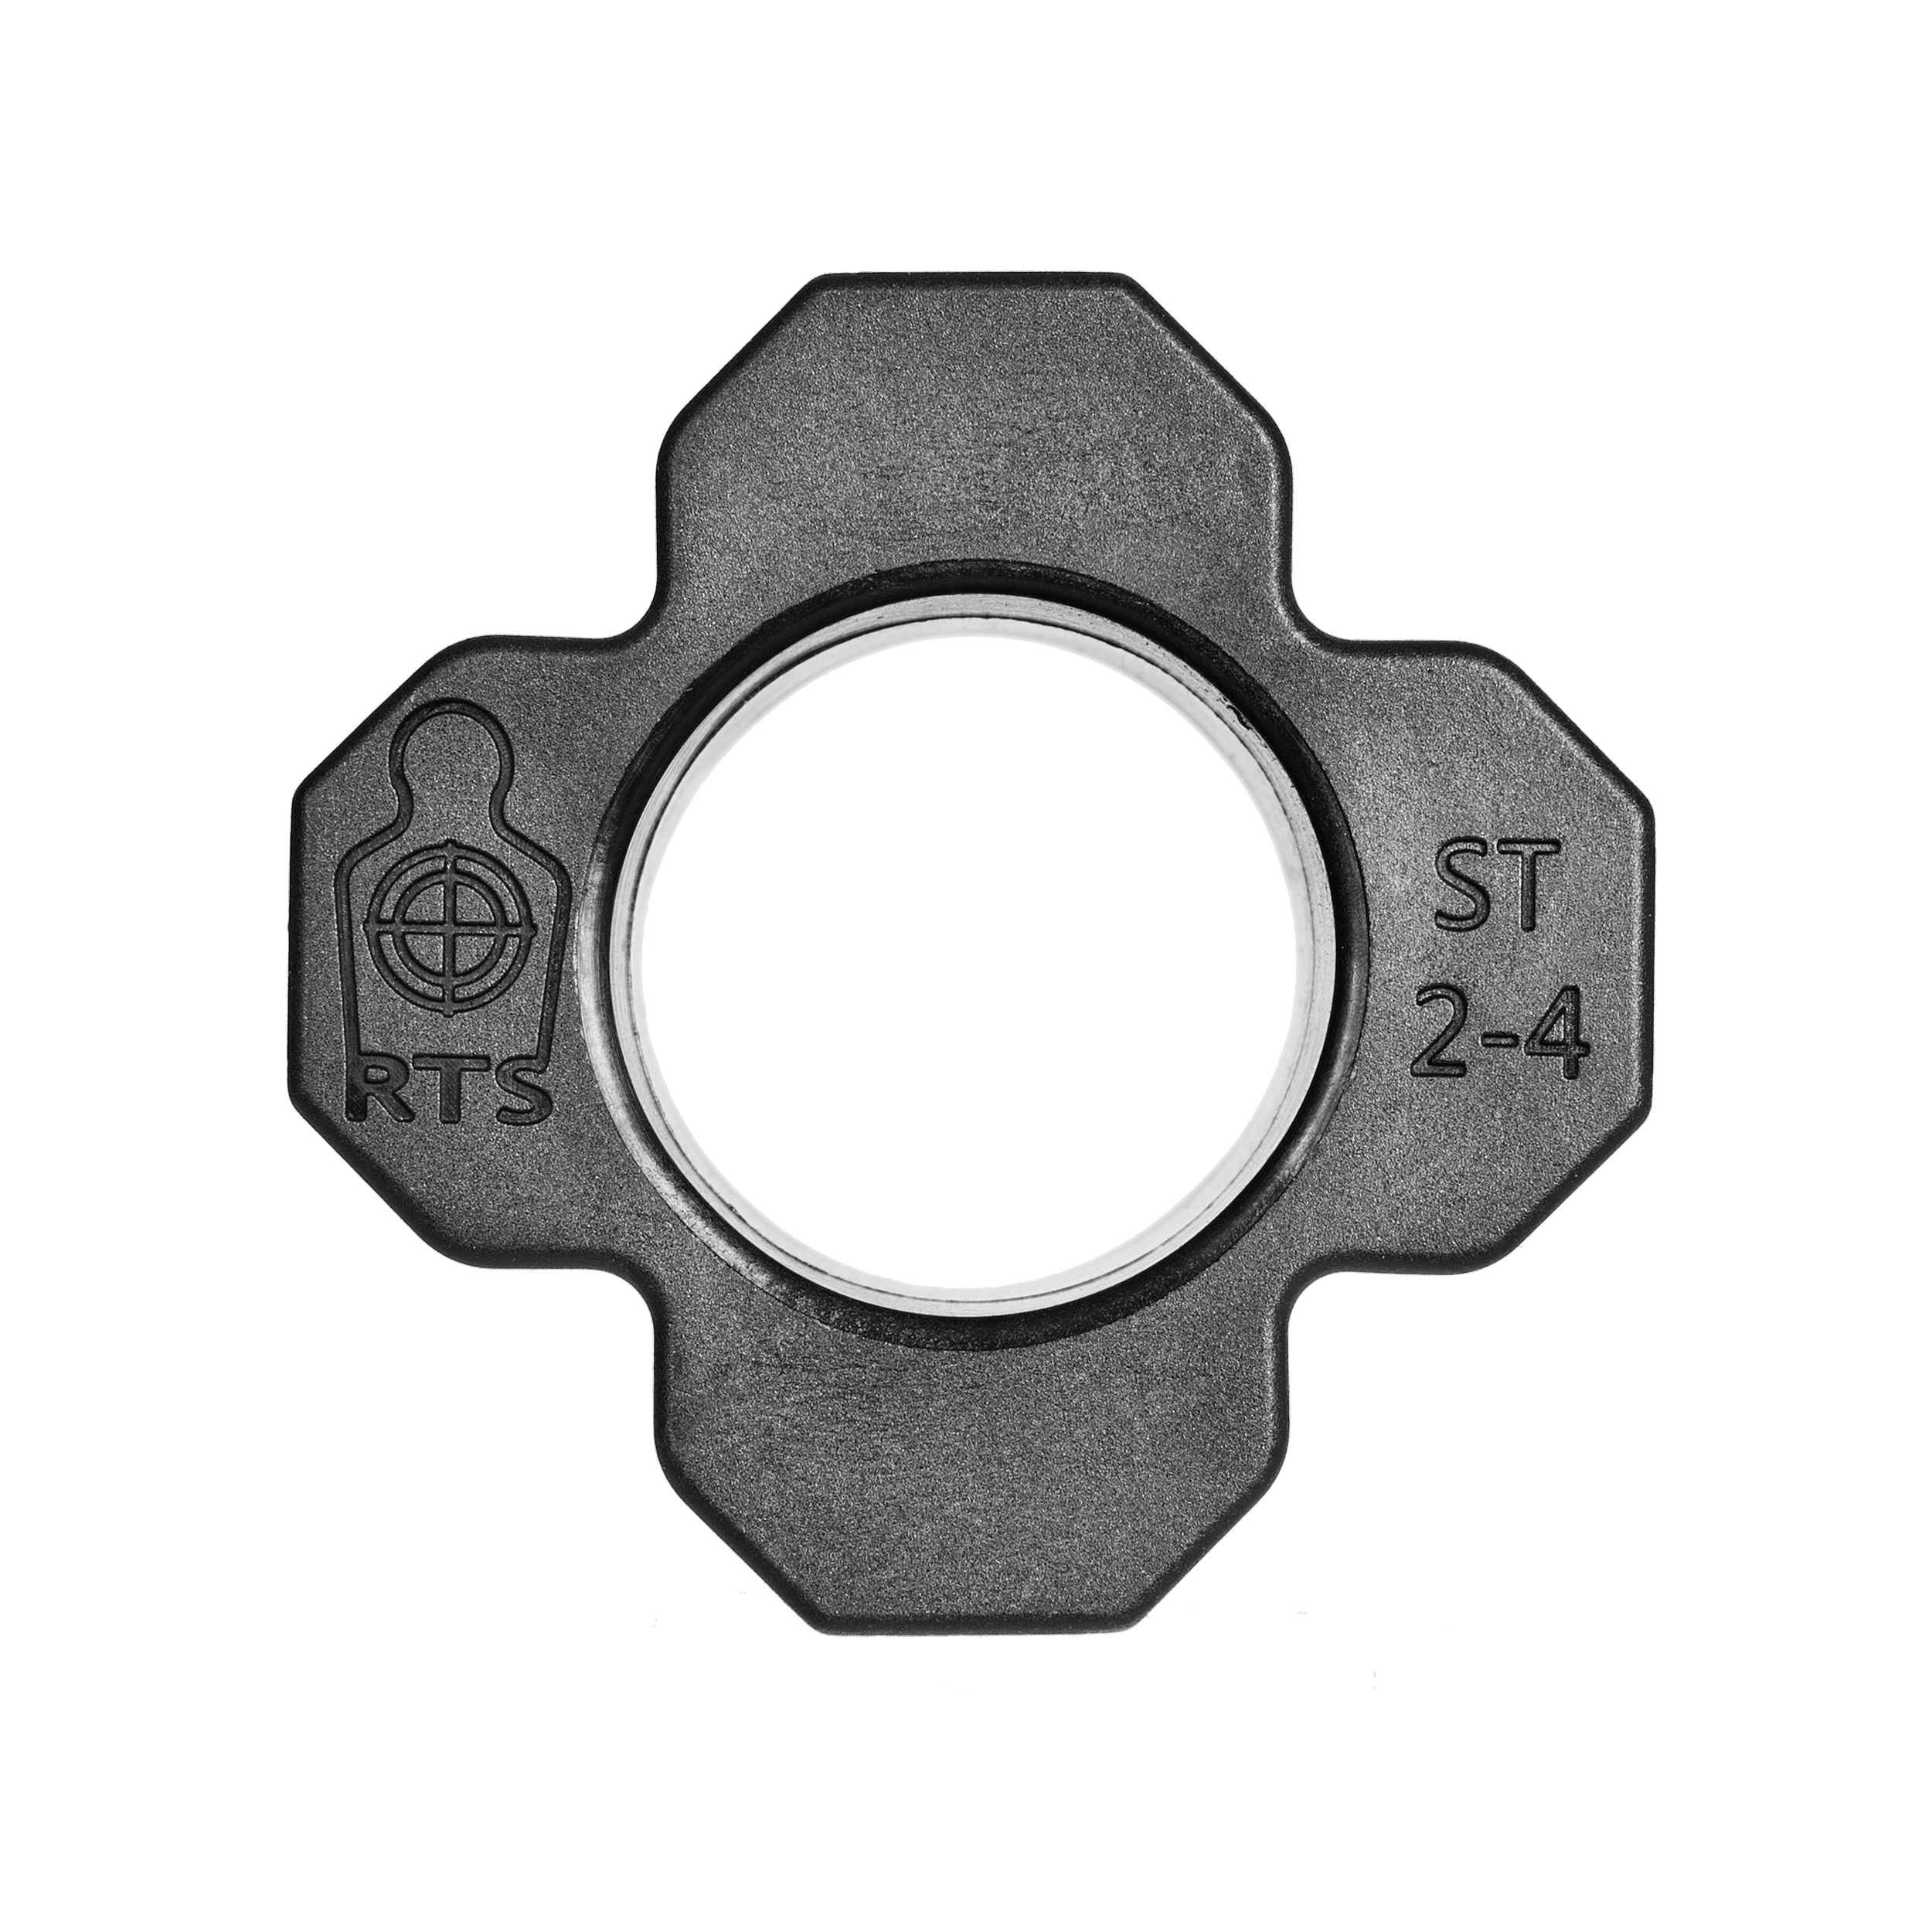 Veleta 2-4 Connector